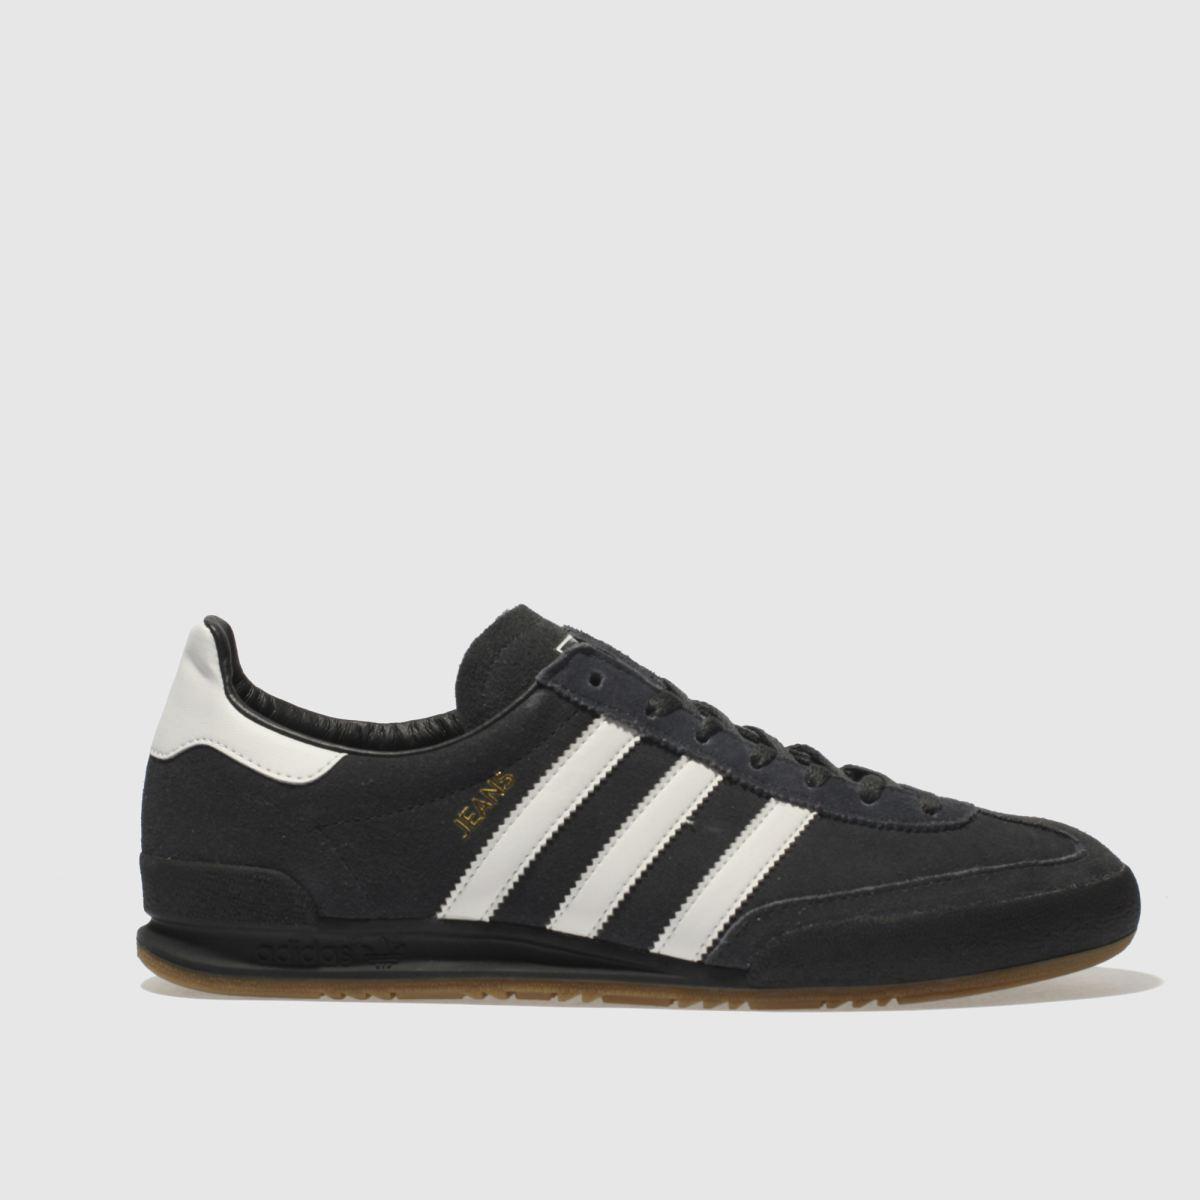 Adidas Dark Grey Jeans Trainers